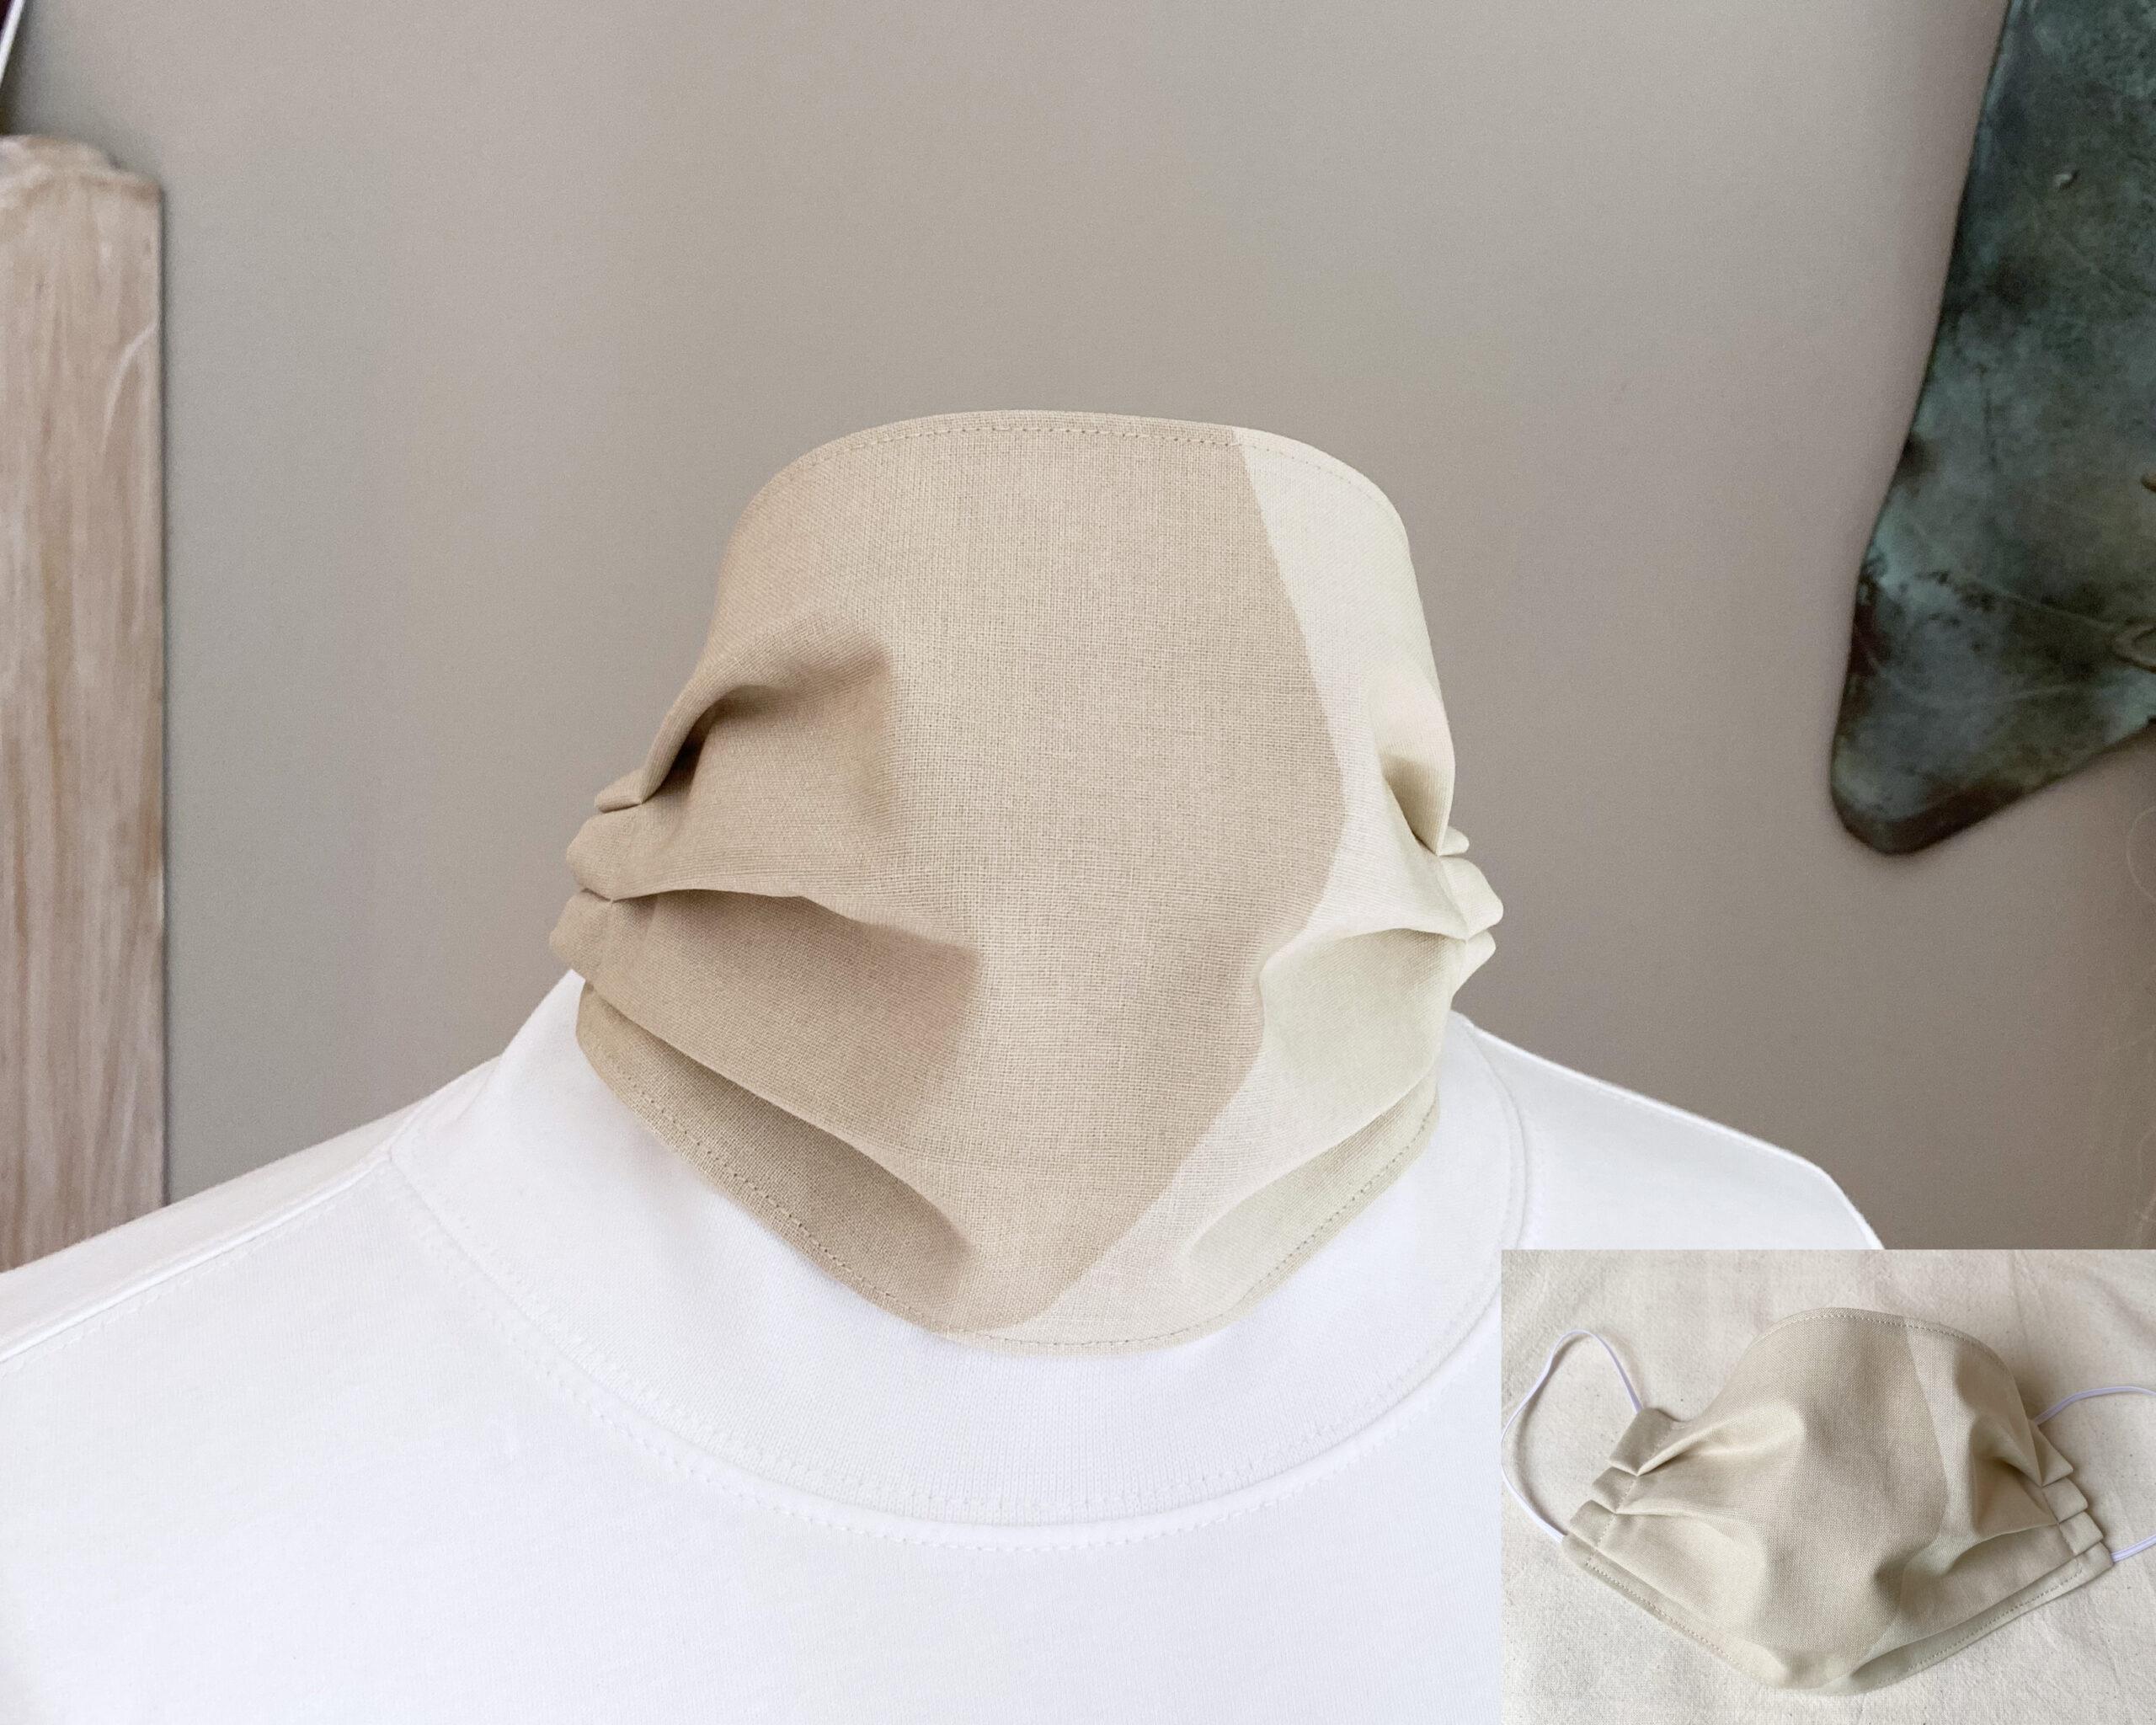 marimekko fabric face mask kivet